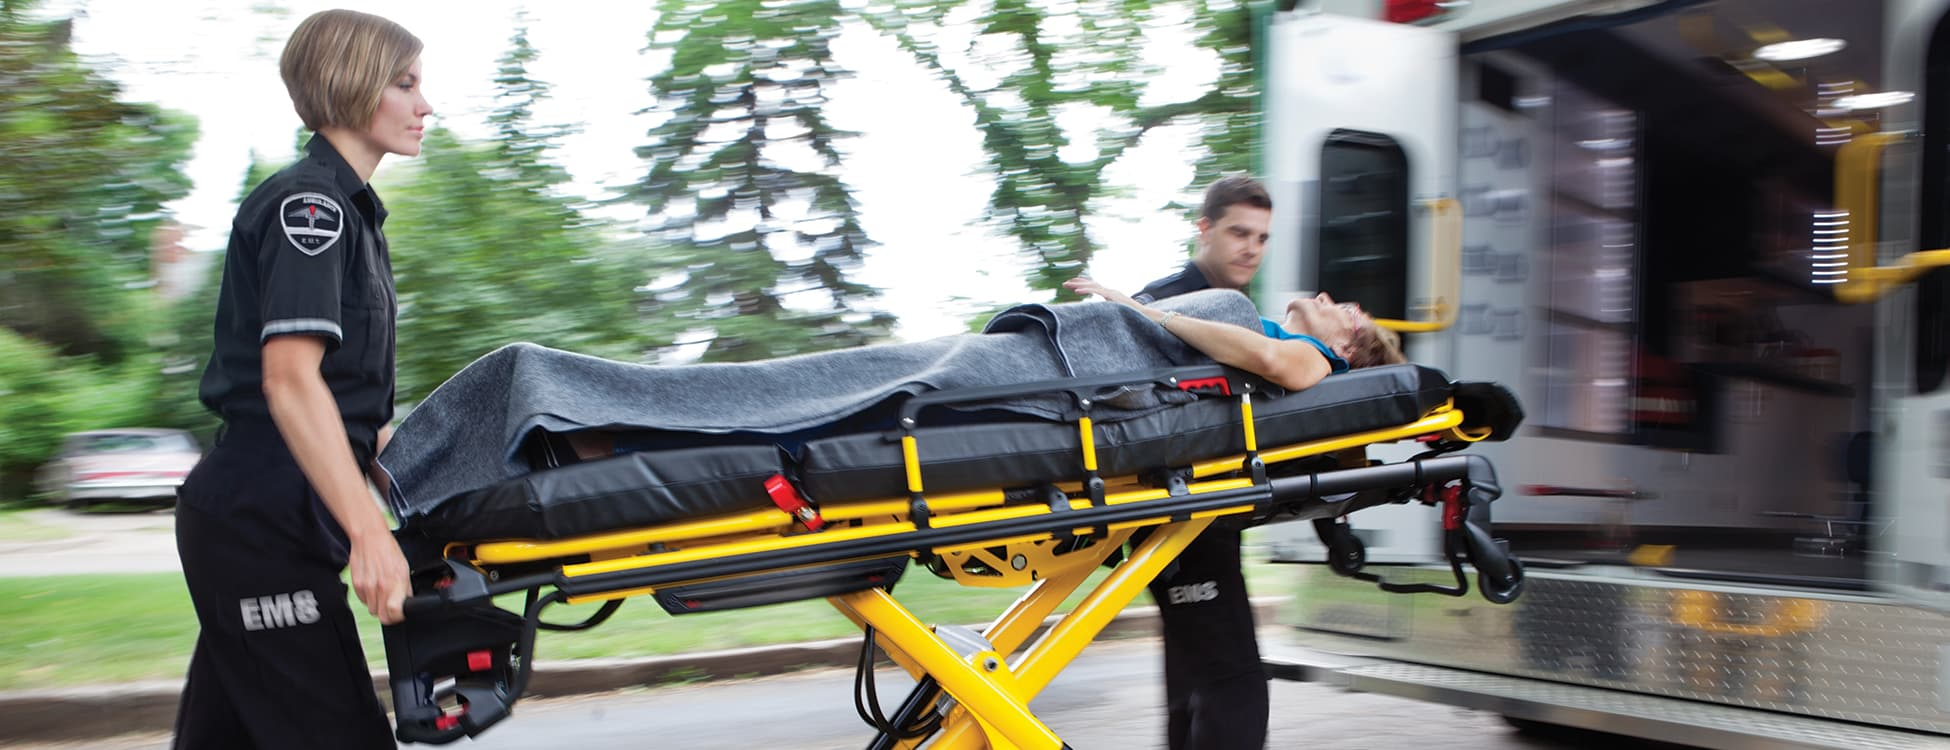 paramedicine, health care, ambulance